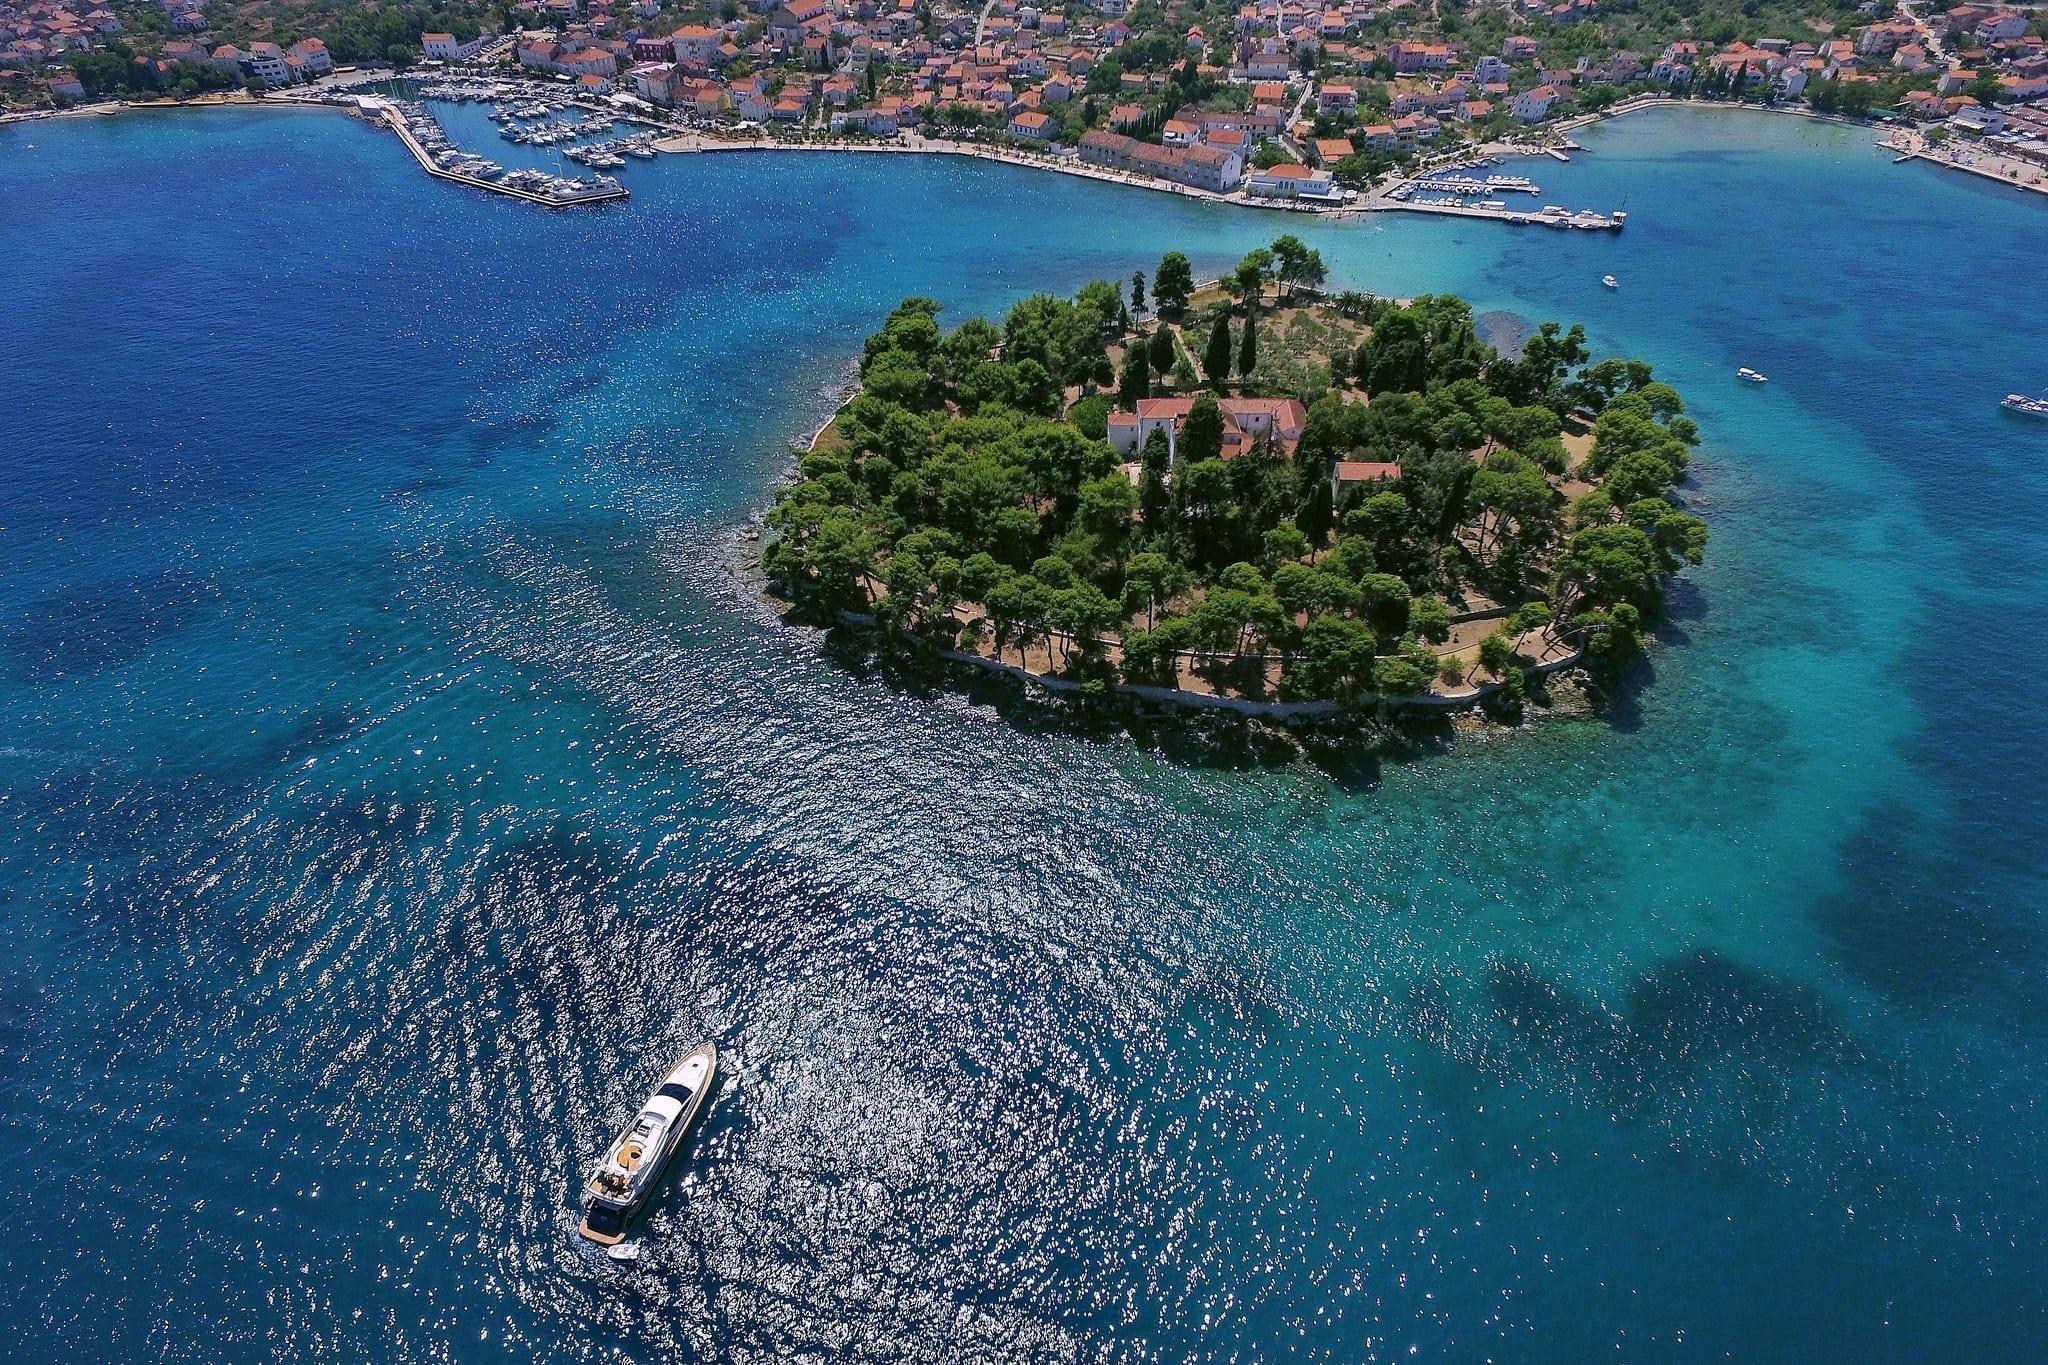 Beautiful Croatia - amazing destination for luxury yacht charter this summer